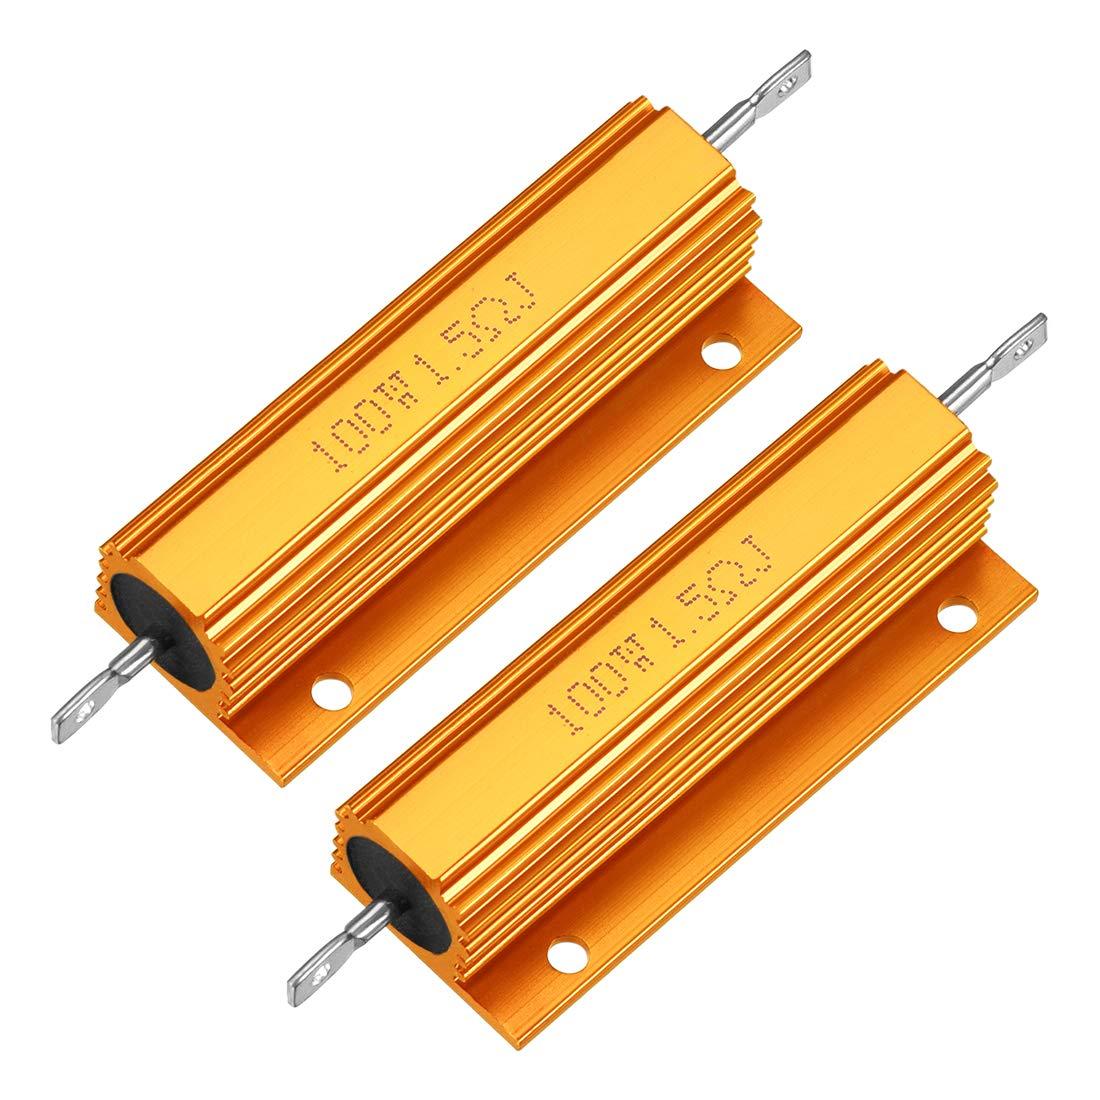 uxcell 2Pcs Aluminum Case Max 43% OFF Resistor 100W Ohm 1.5 Wirewound Tulsa Mall Yellow